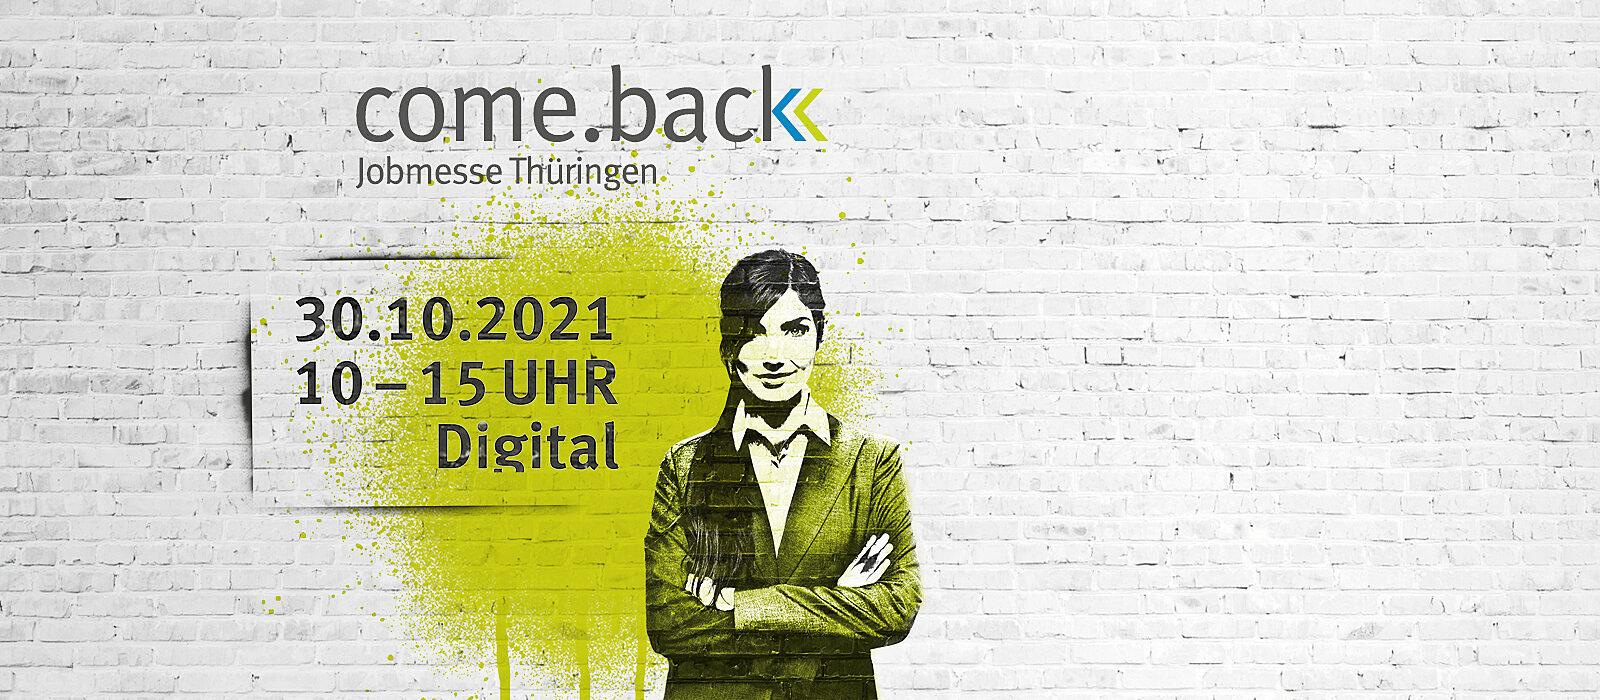 Anmeldeseite comeback Copyright: © LEG Thüringen/ThAFF